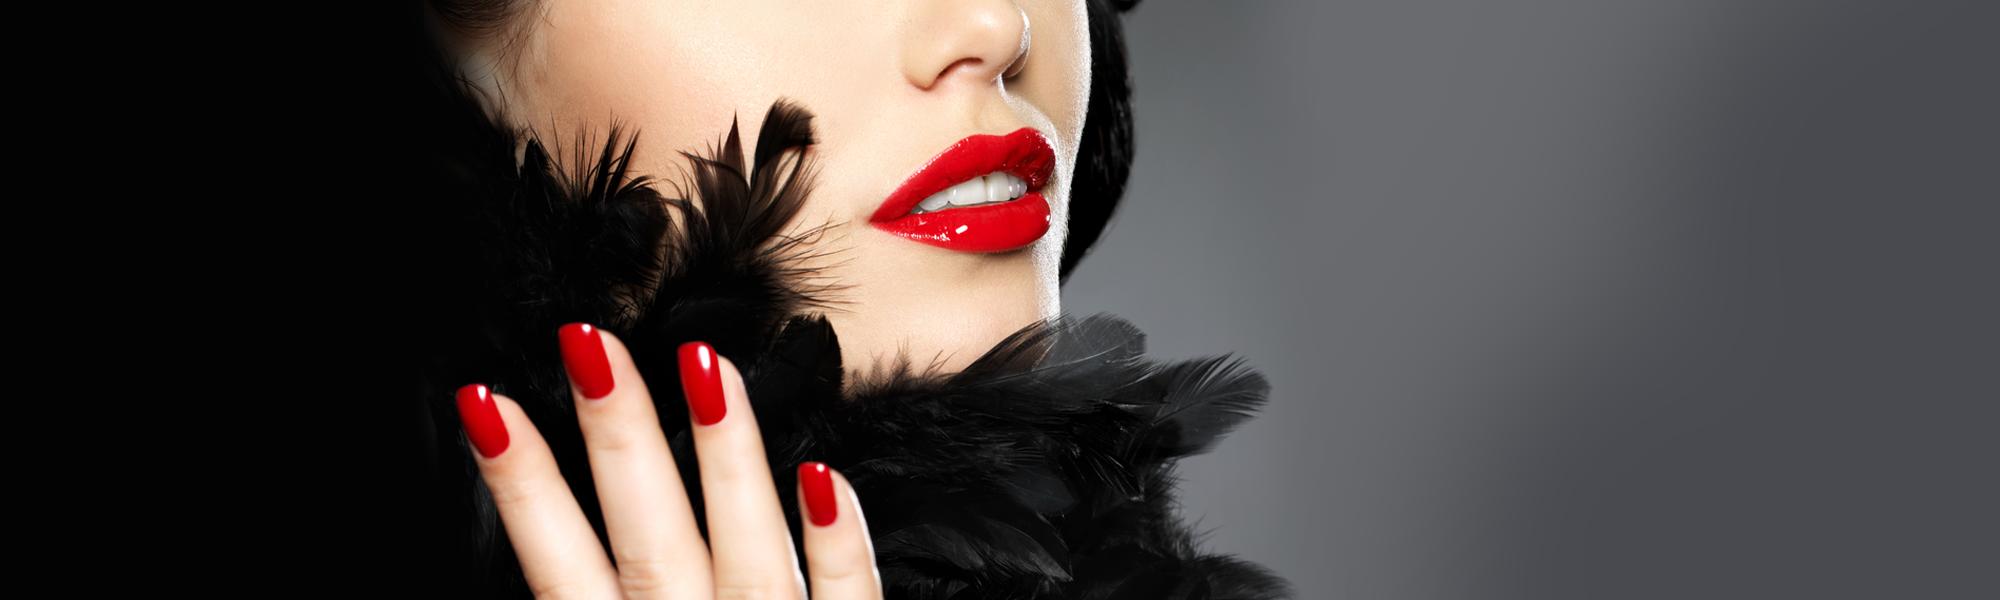 bloom-beaty-studio-nail-treatment-manicure-pedicure-barrington